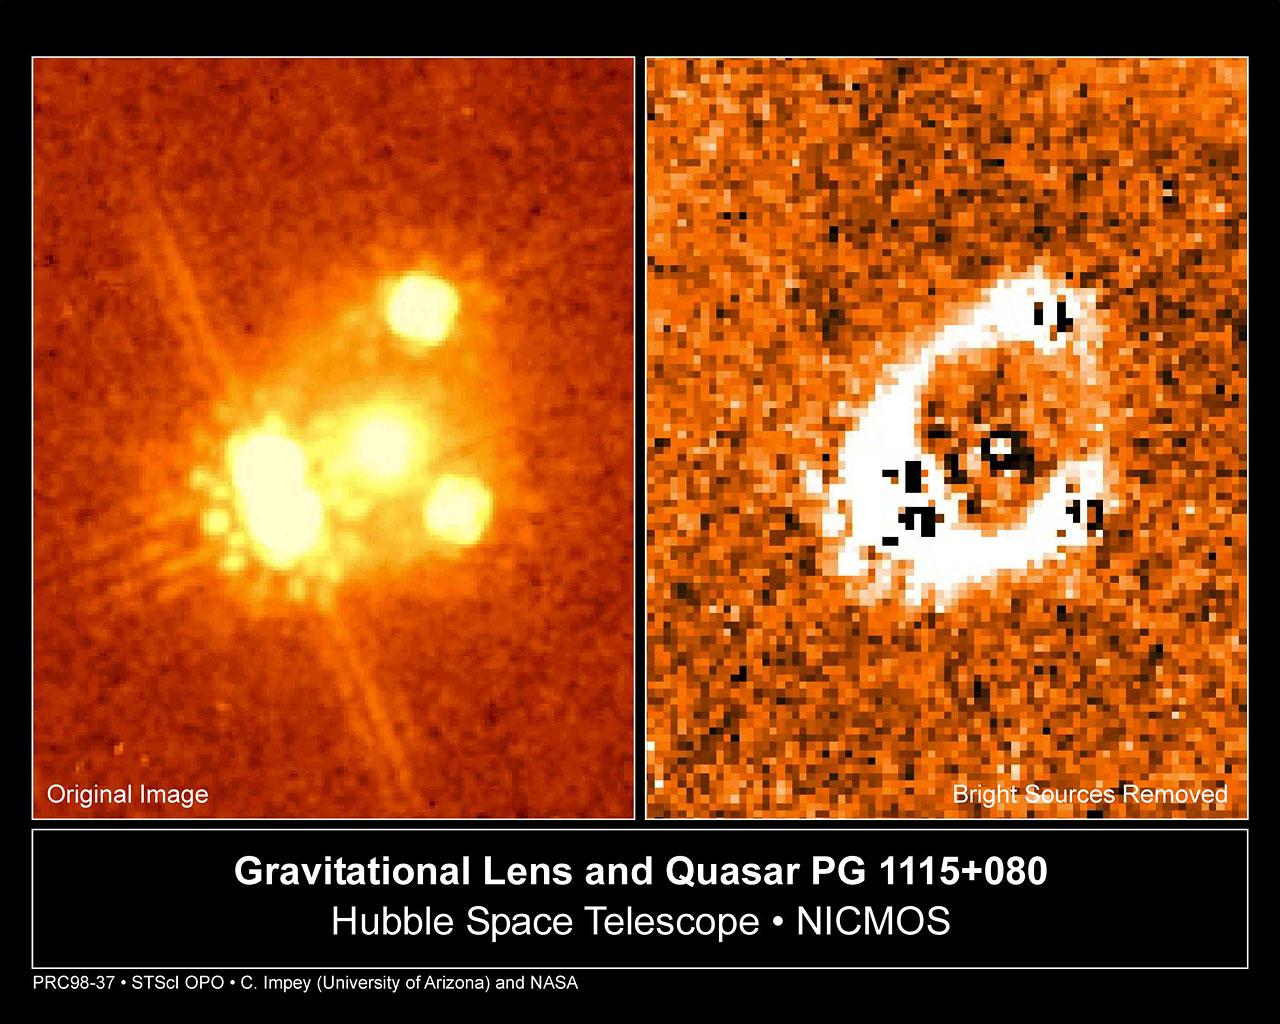 Gravitational Lens and Quasar PG 1115+080